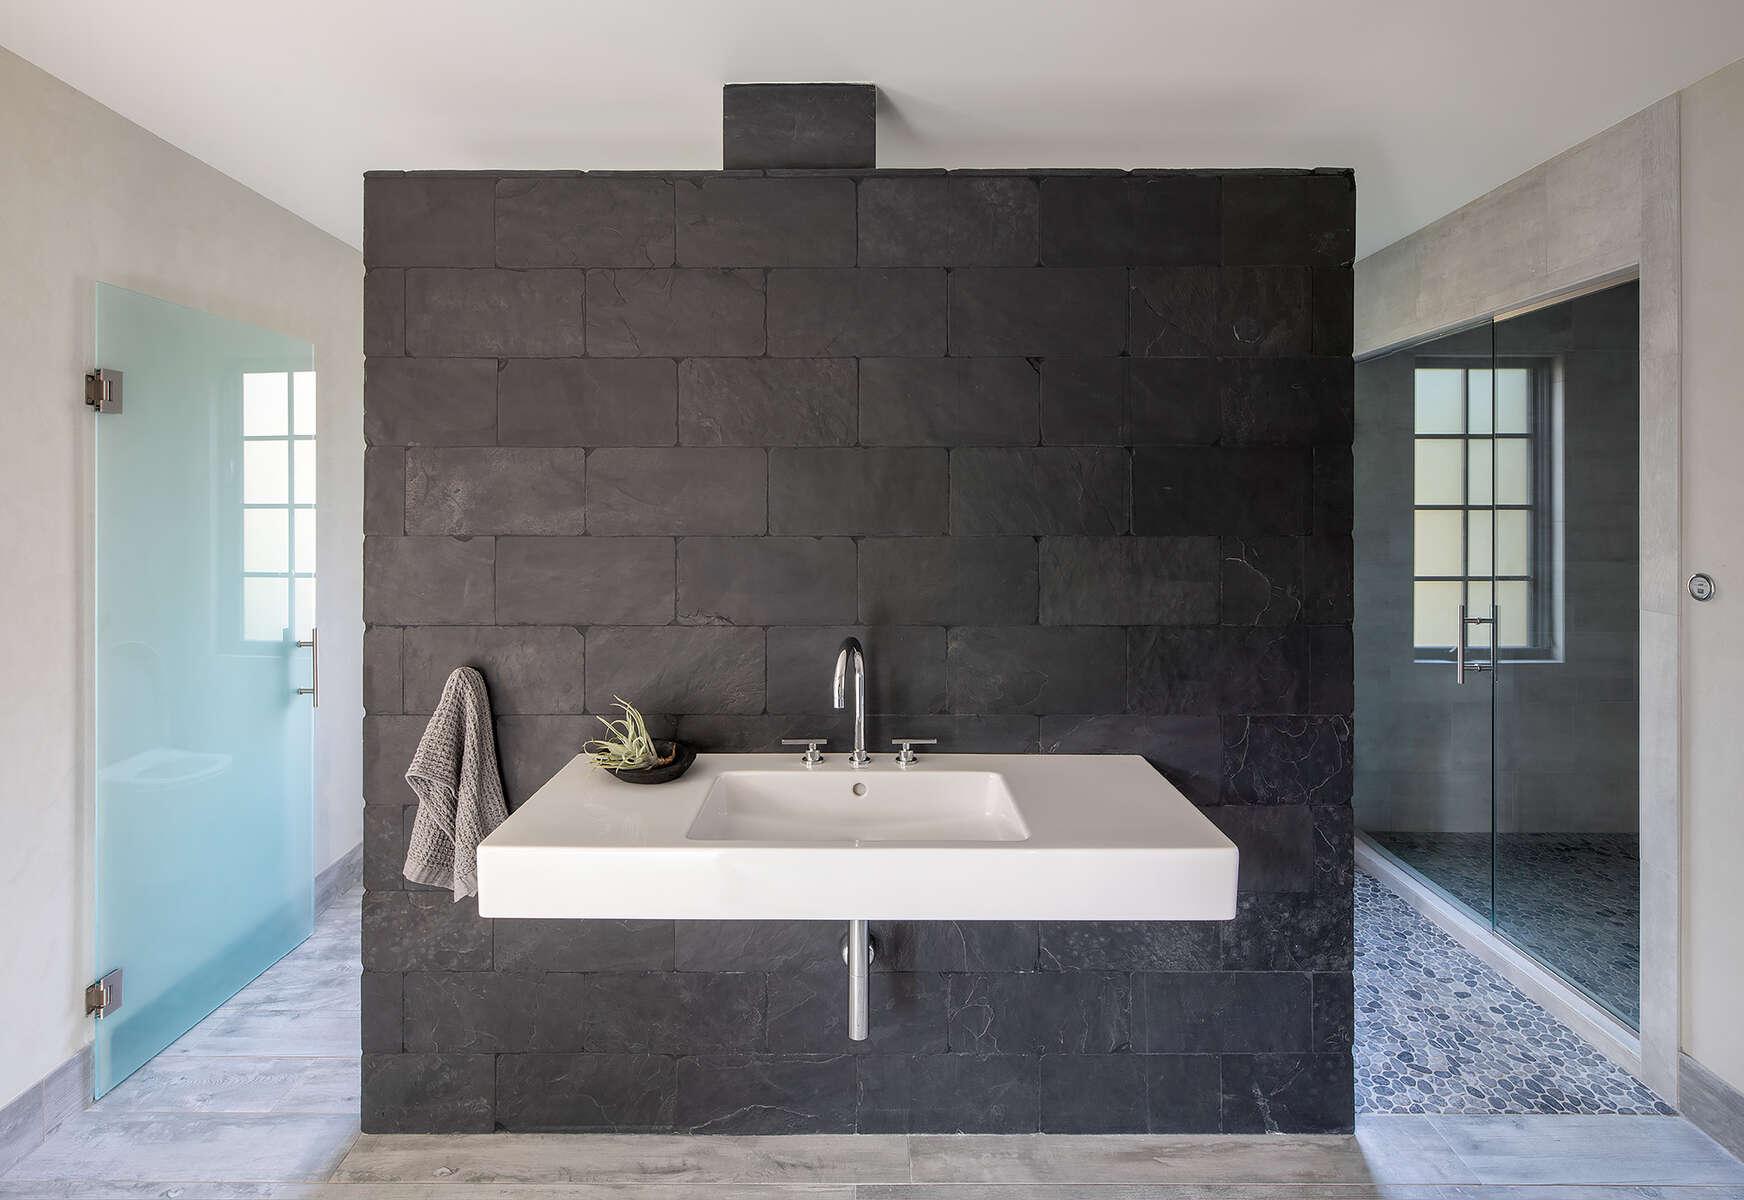 Ed Weber ArchitectsGlasser ResidenceGuest HouseWashington, DC